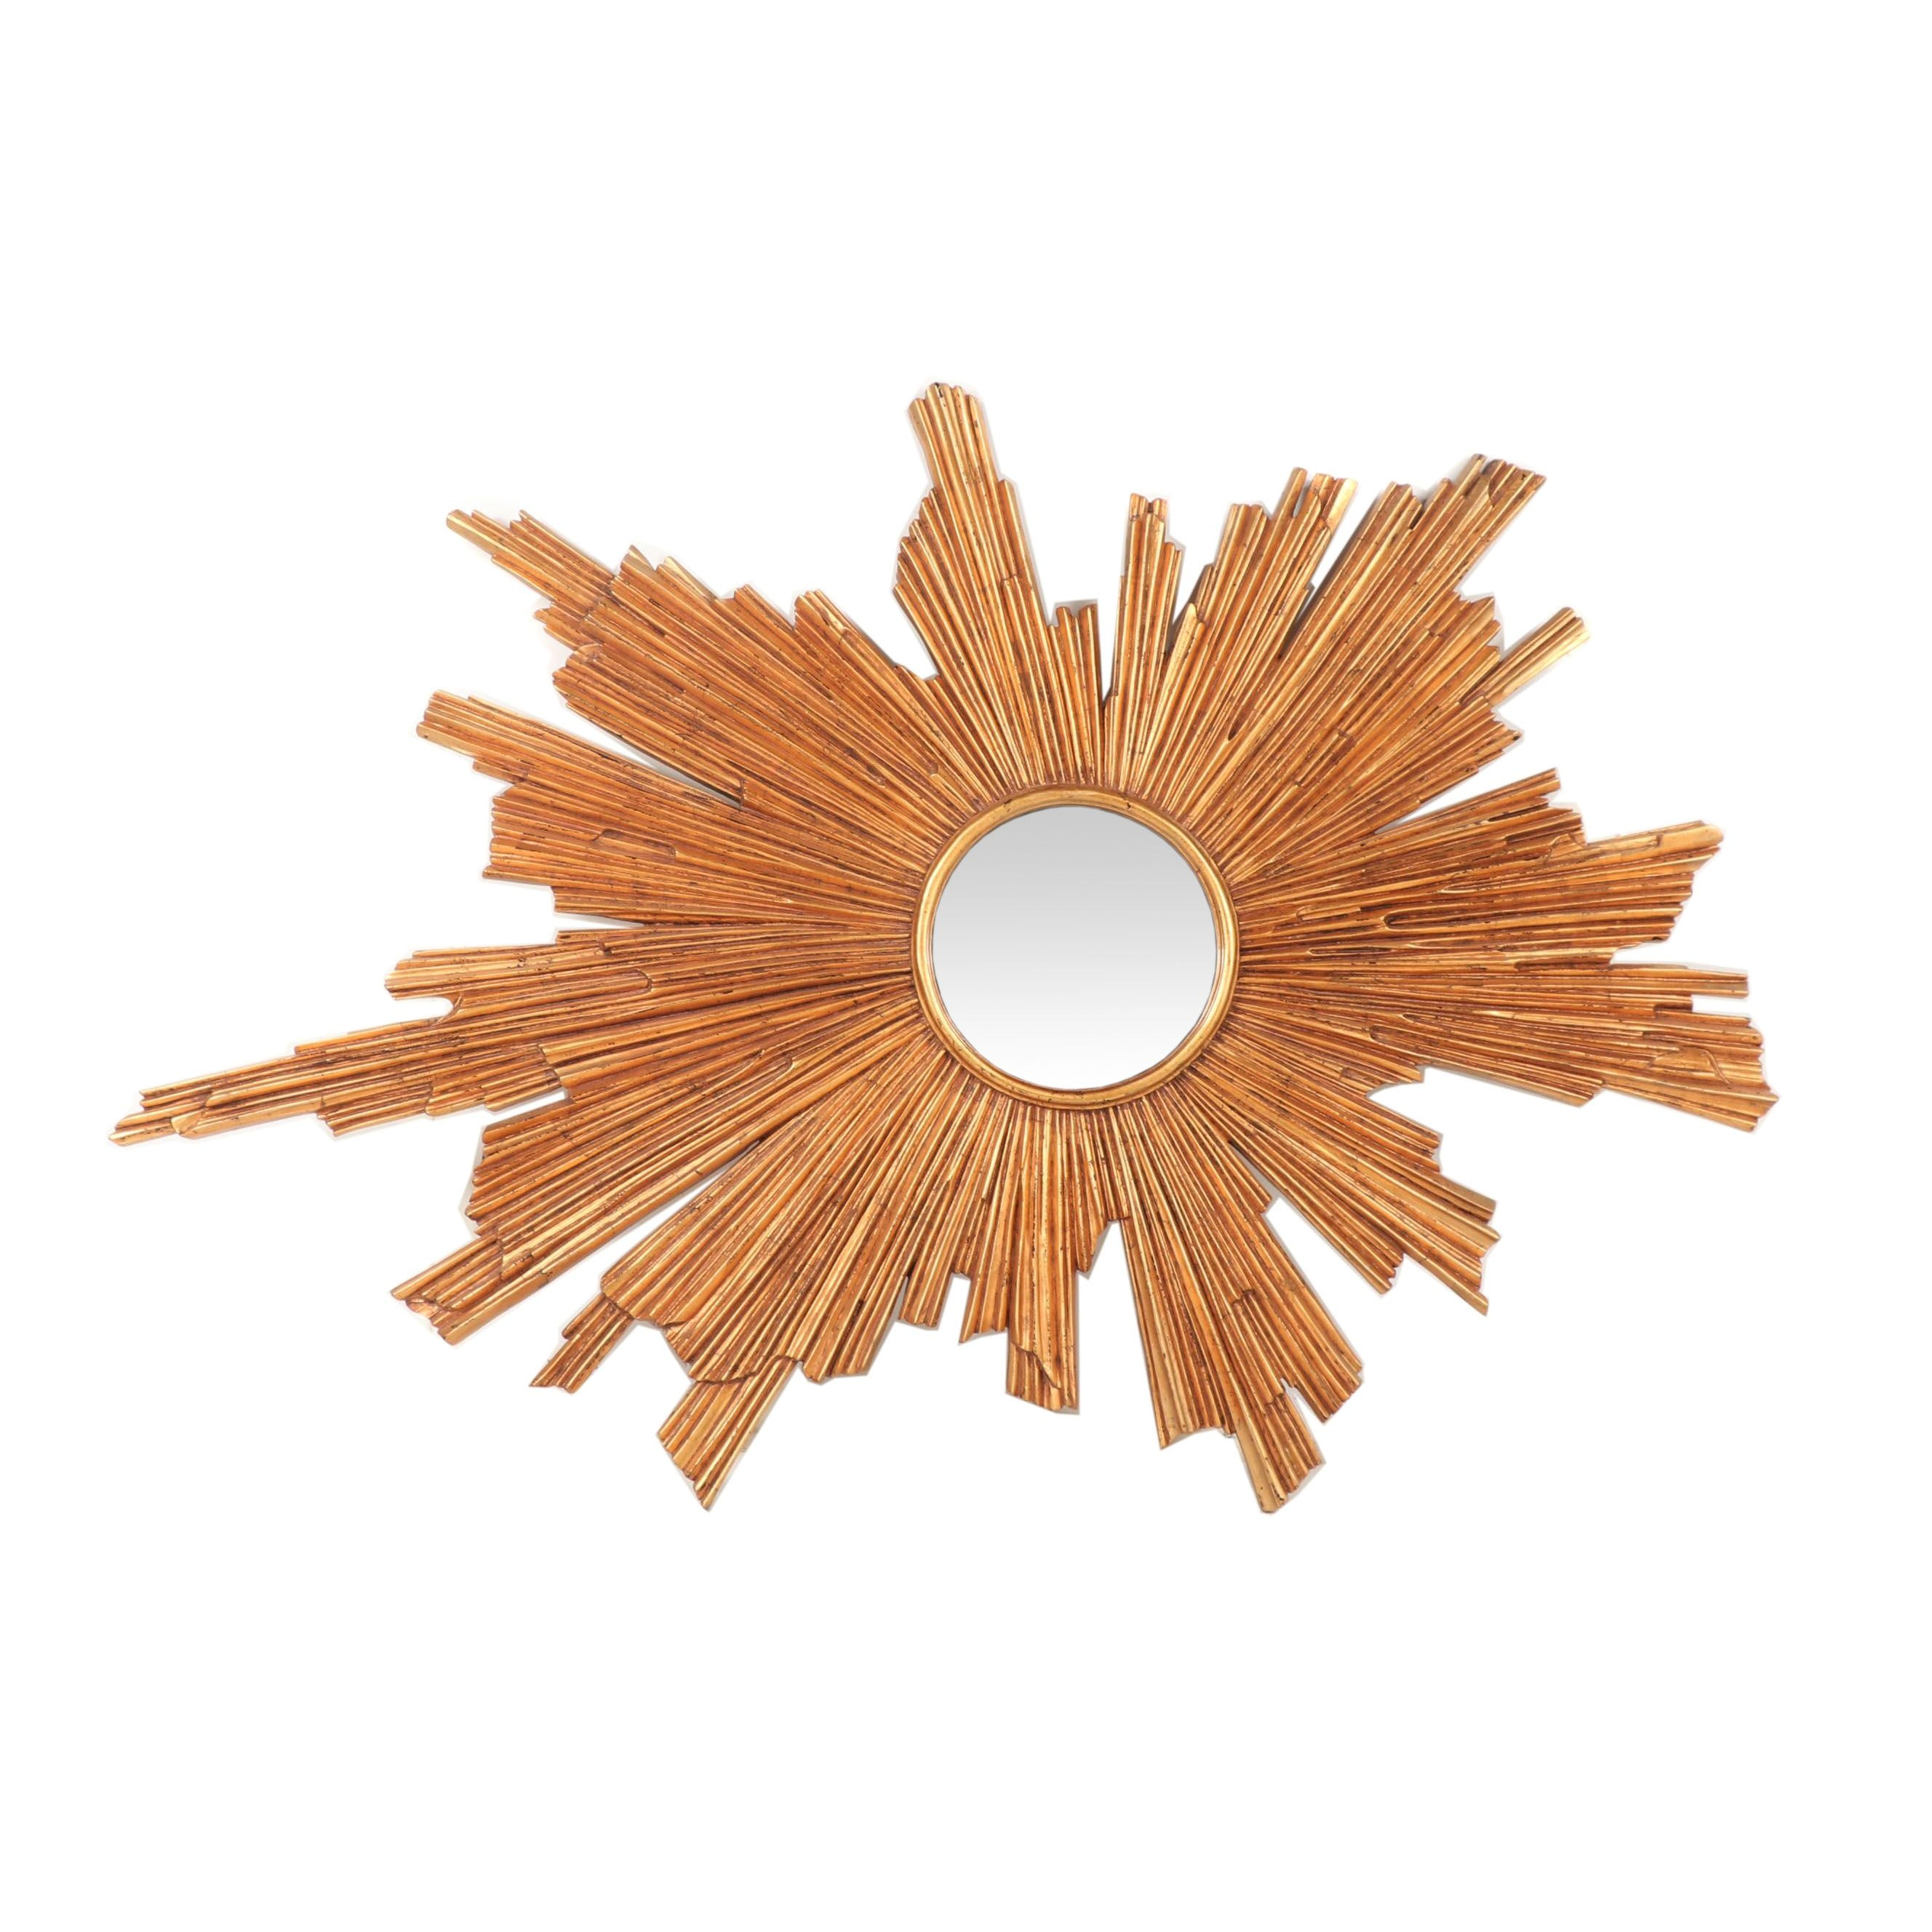 Mid-Century Modern Style Gilt Composition Wood Sunburst Wall Mirror